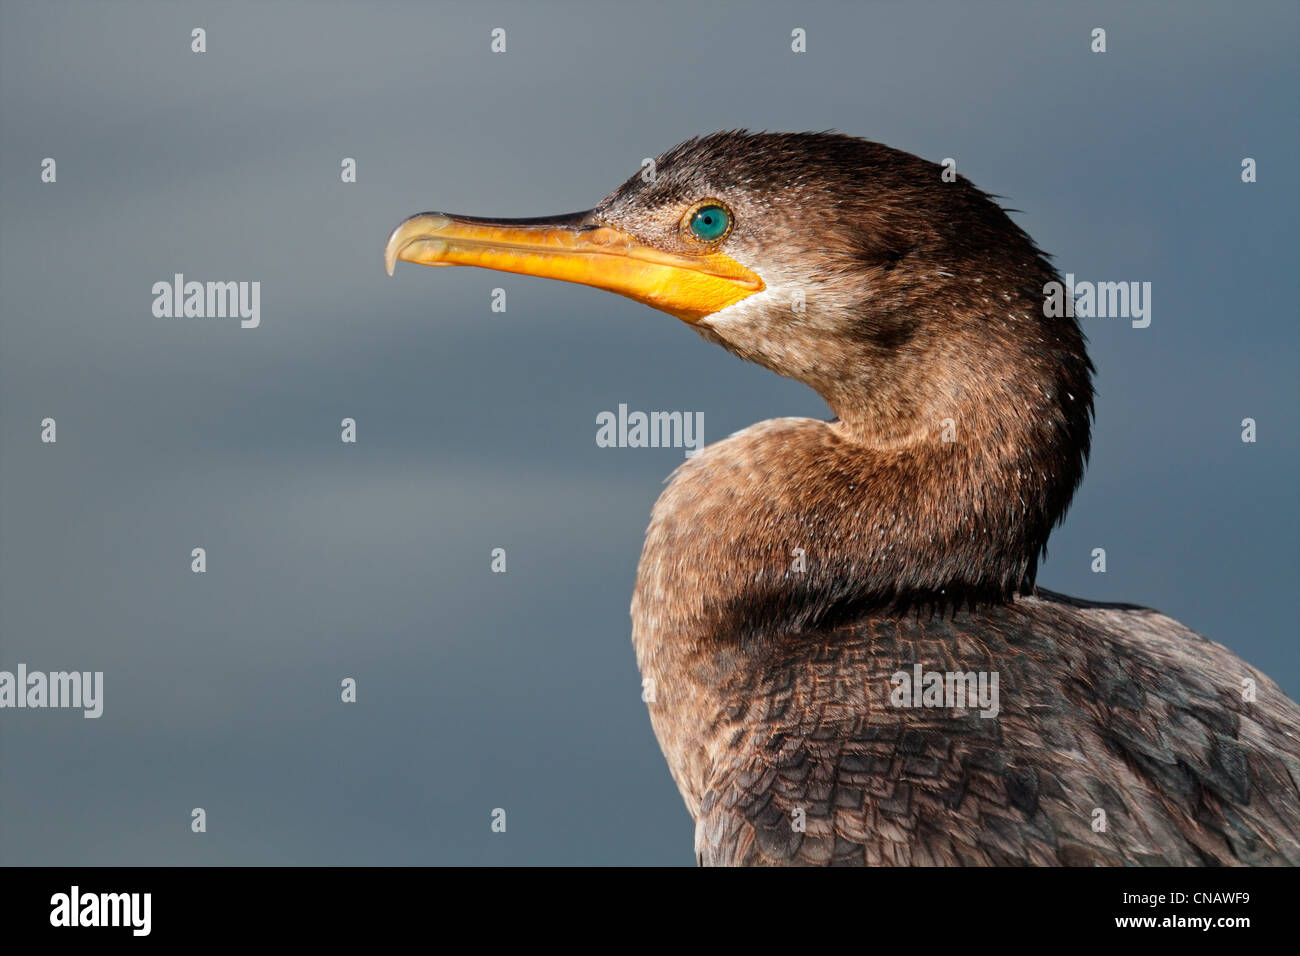 Portrait of a Neotropic cormorant (Phalacrocorax brasilianus), South America - Stock Image